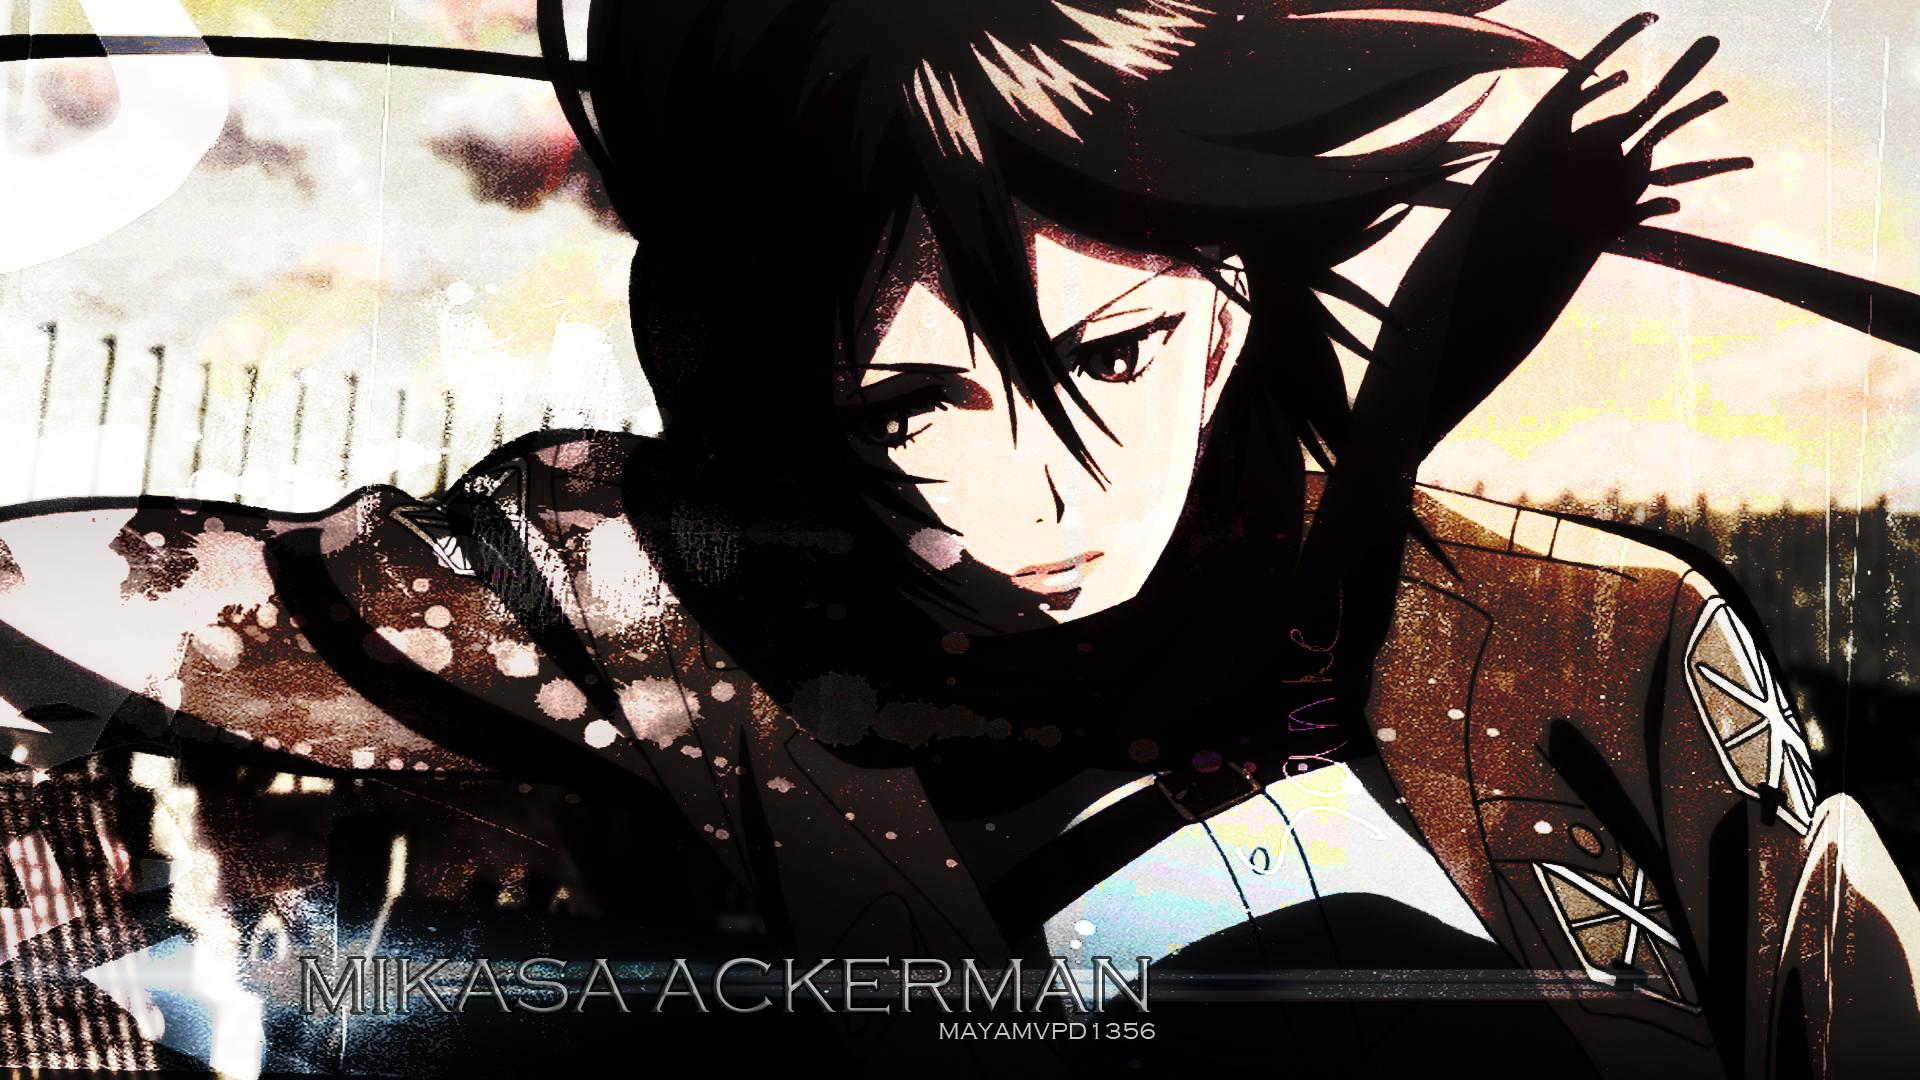 Anime Shingeki No Kyojin Mikasa Ackerman Wallpapers Hd Desktop Anime Wallpaper Manga Art